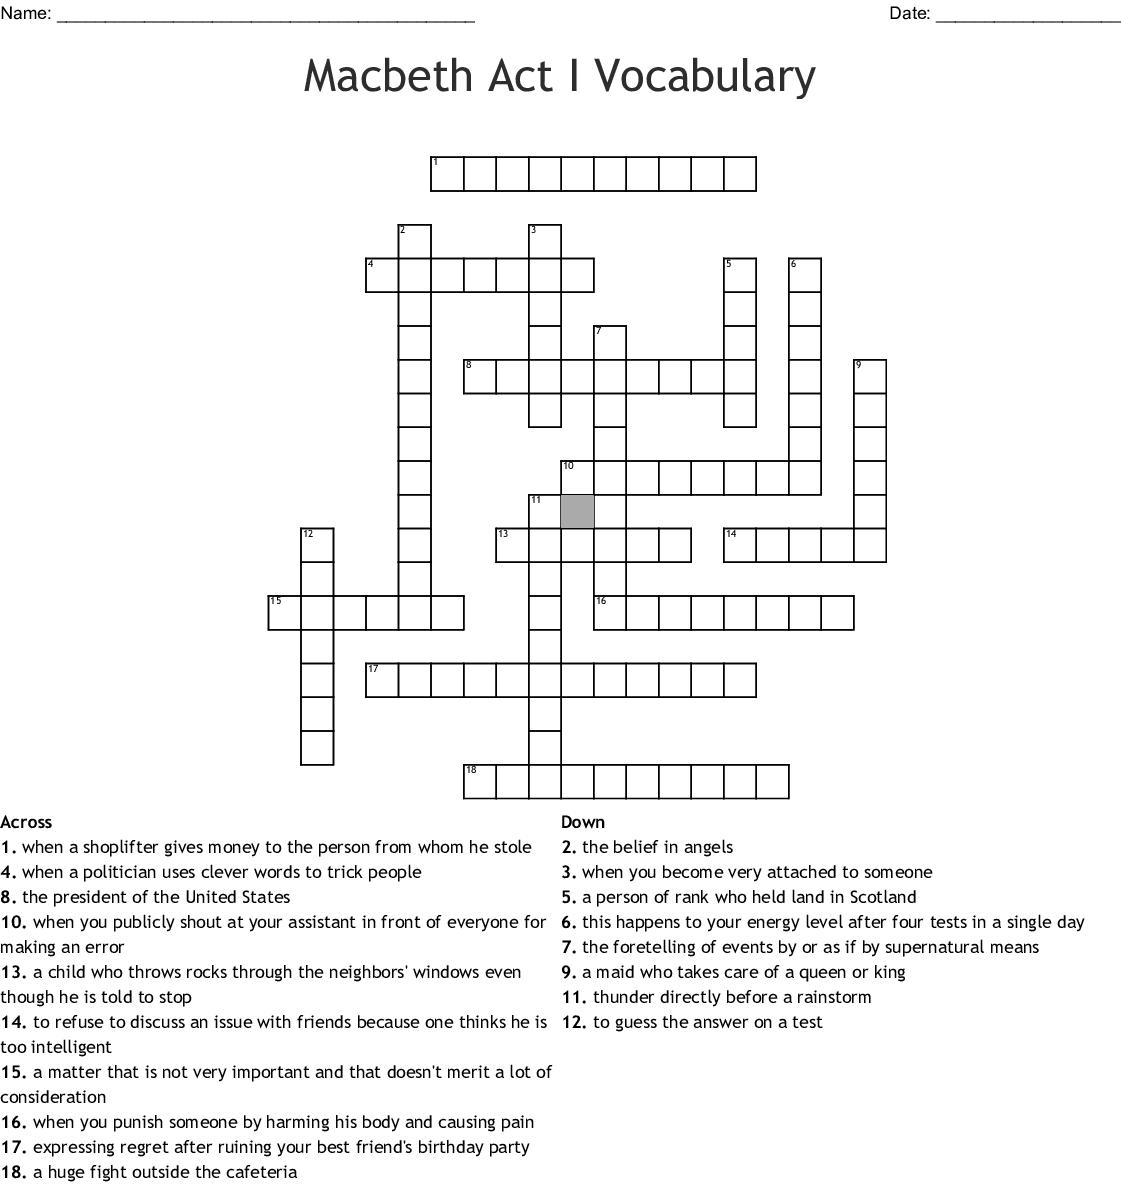 Macbeth Act I Vocabulary Crossword